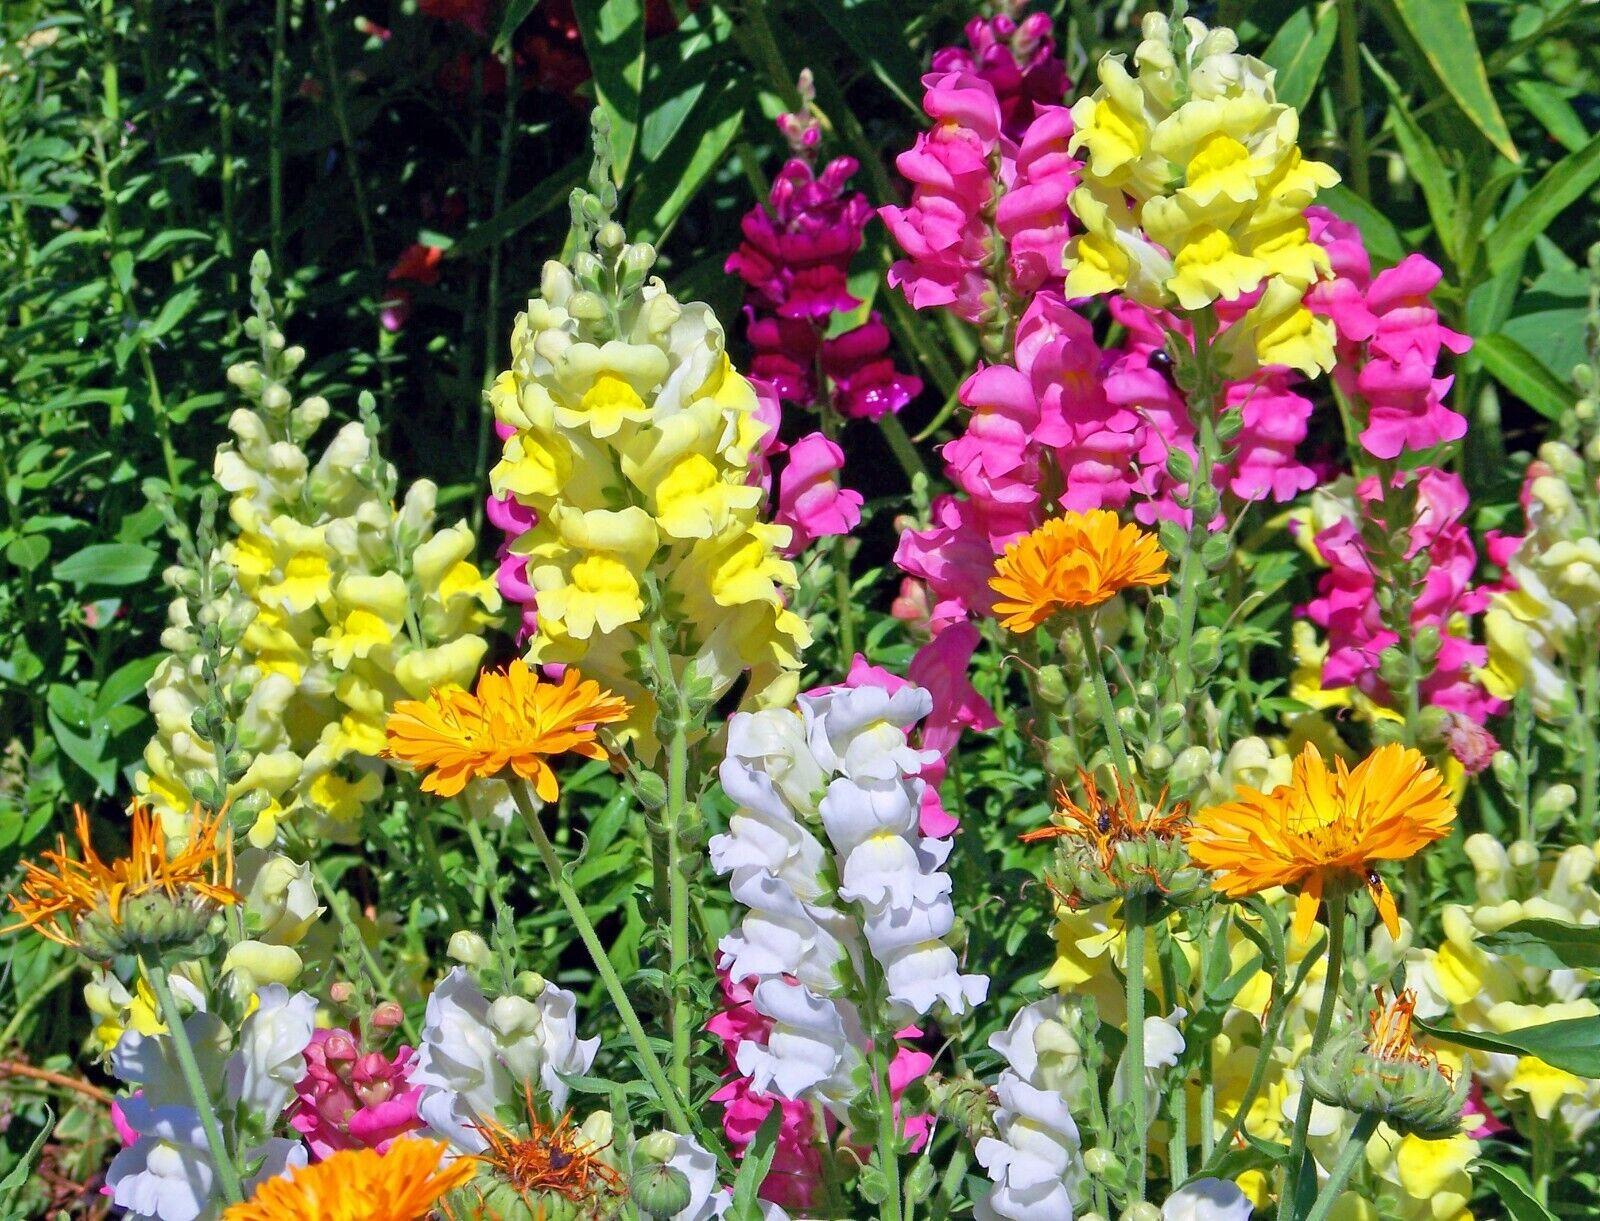 SNAPDRAGON Antirrhinum Mixed Colours 300+ Seeds Perennial Flower/Cottage Garden